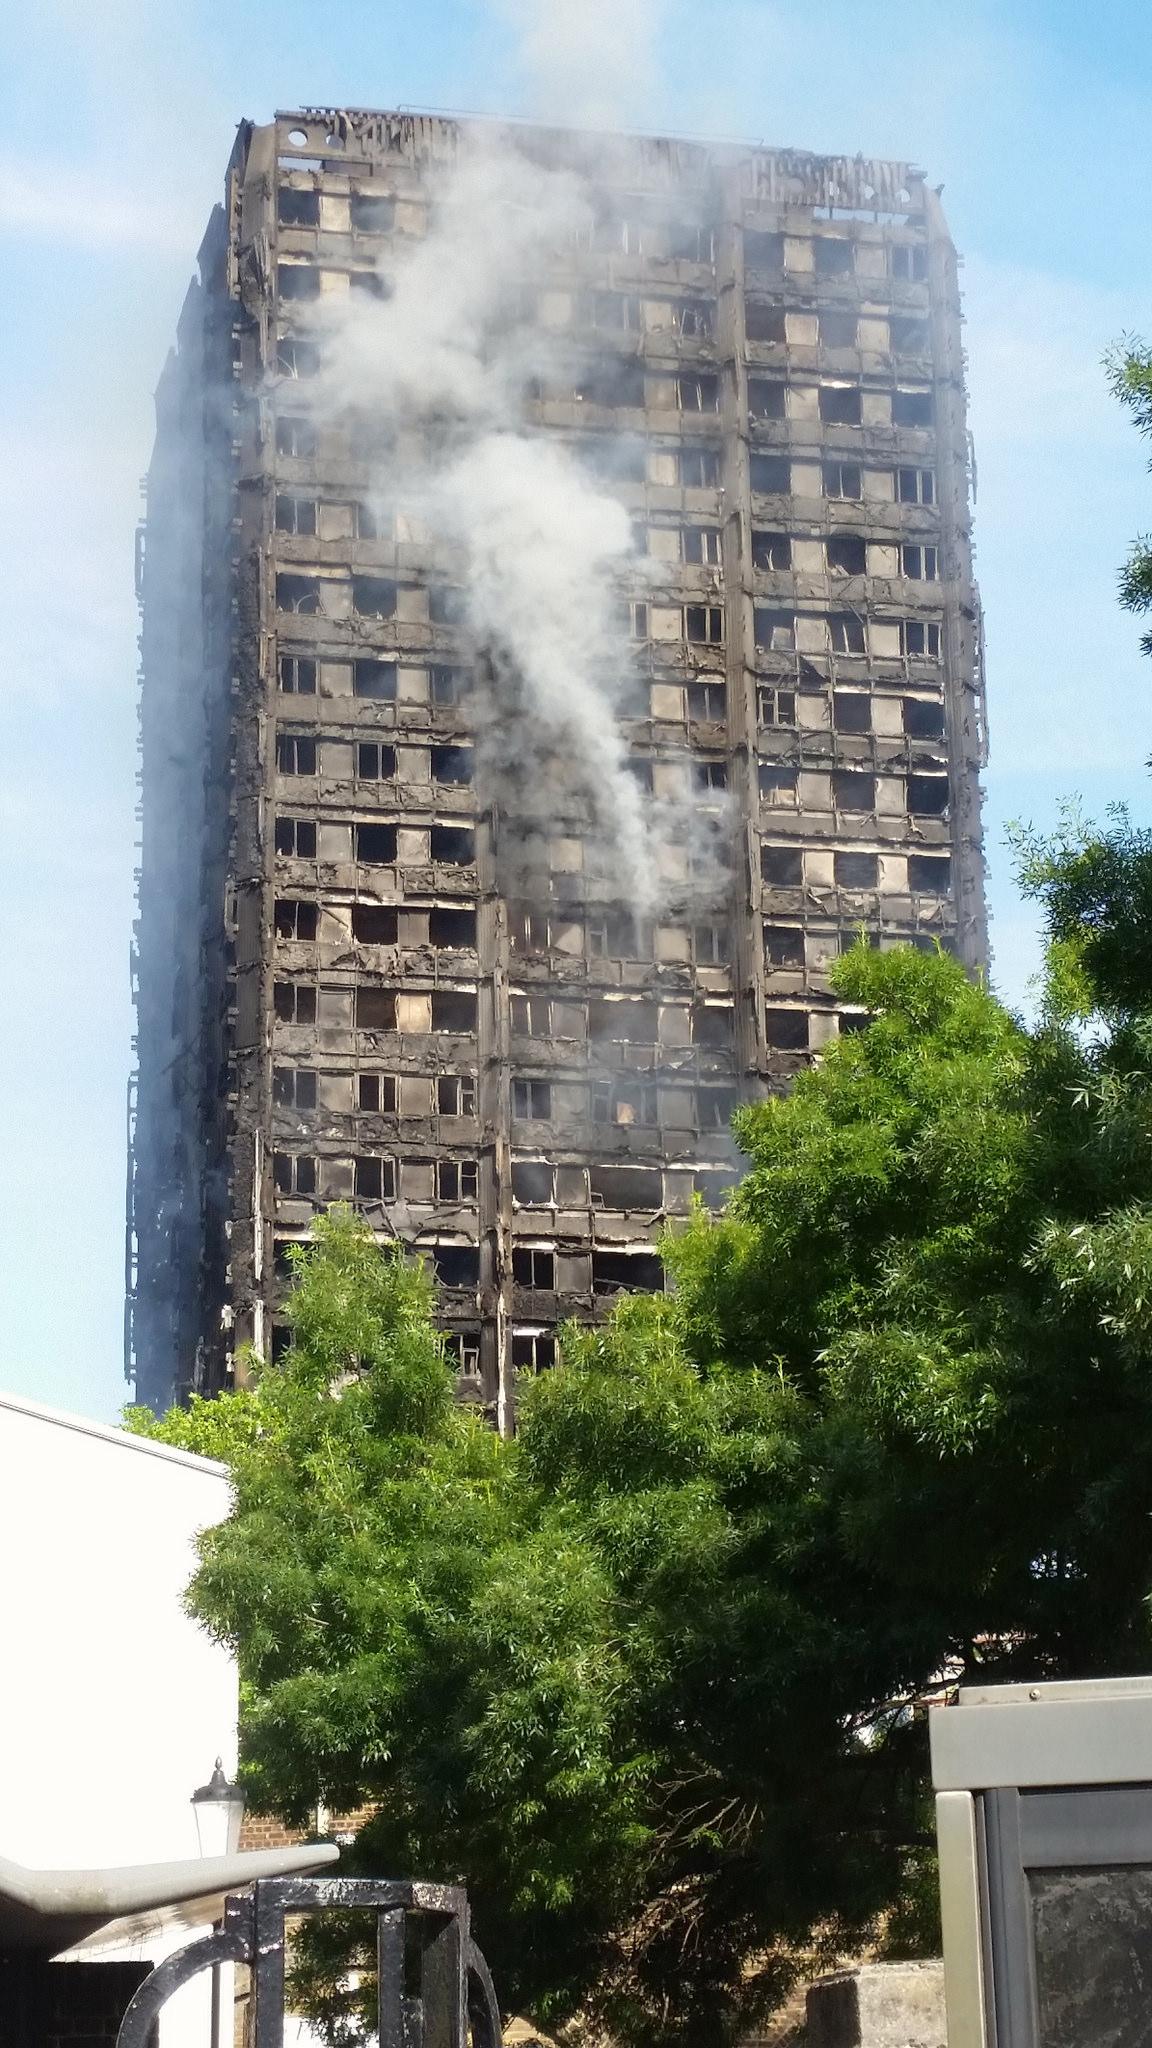 Grenfell Tower fire: Photo by sarflondondunc (Flickr, creative comms)